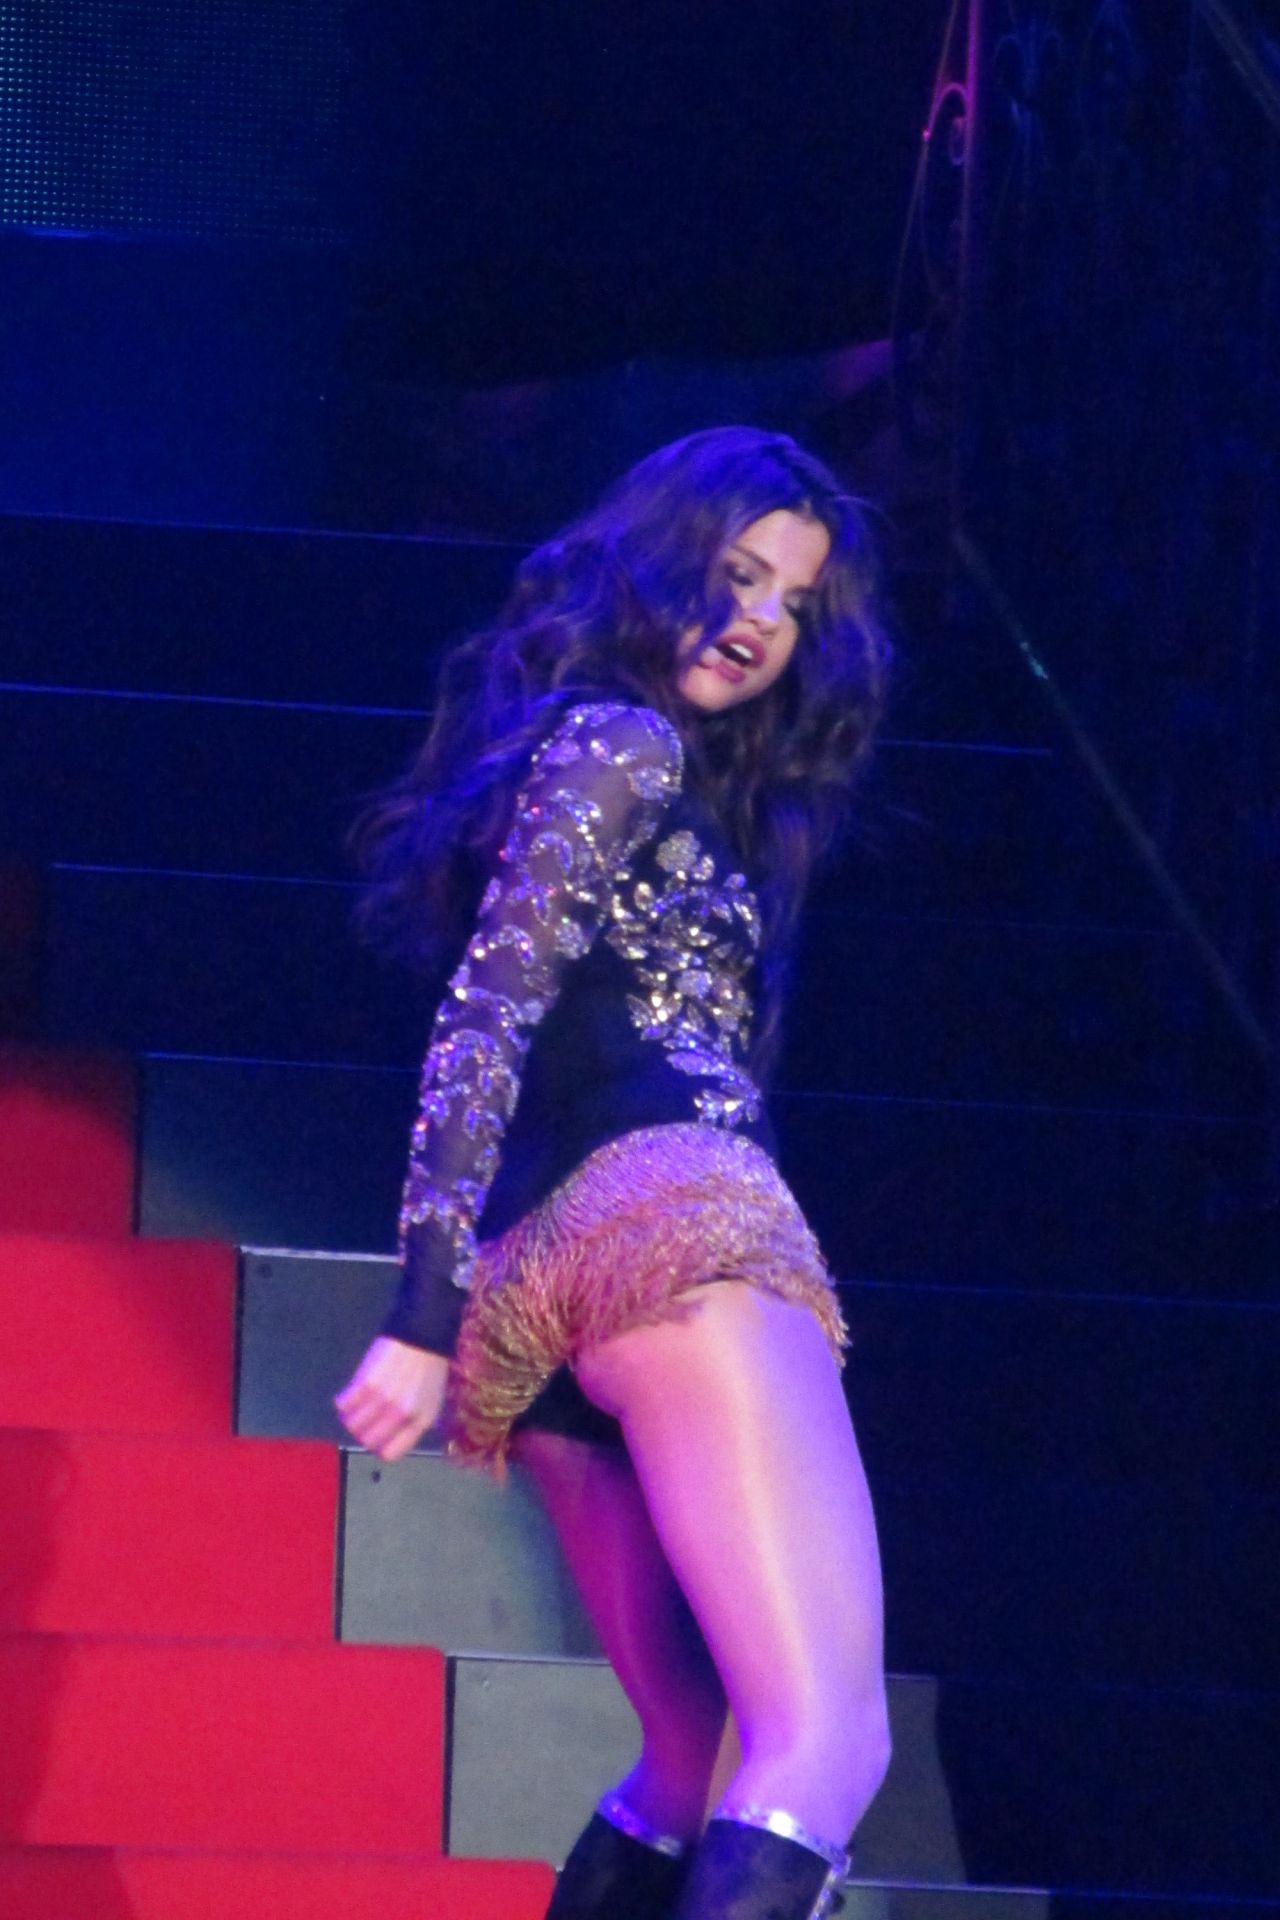 Selena Gomez Performing at Her Stars Dance Concert Tour in Las Vegas